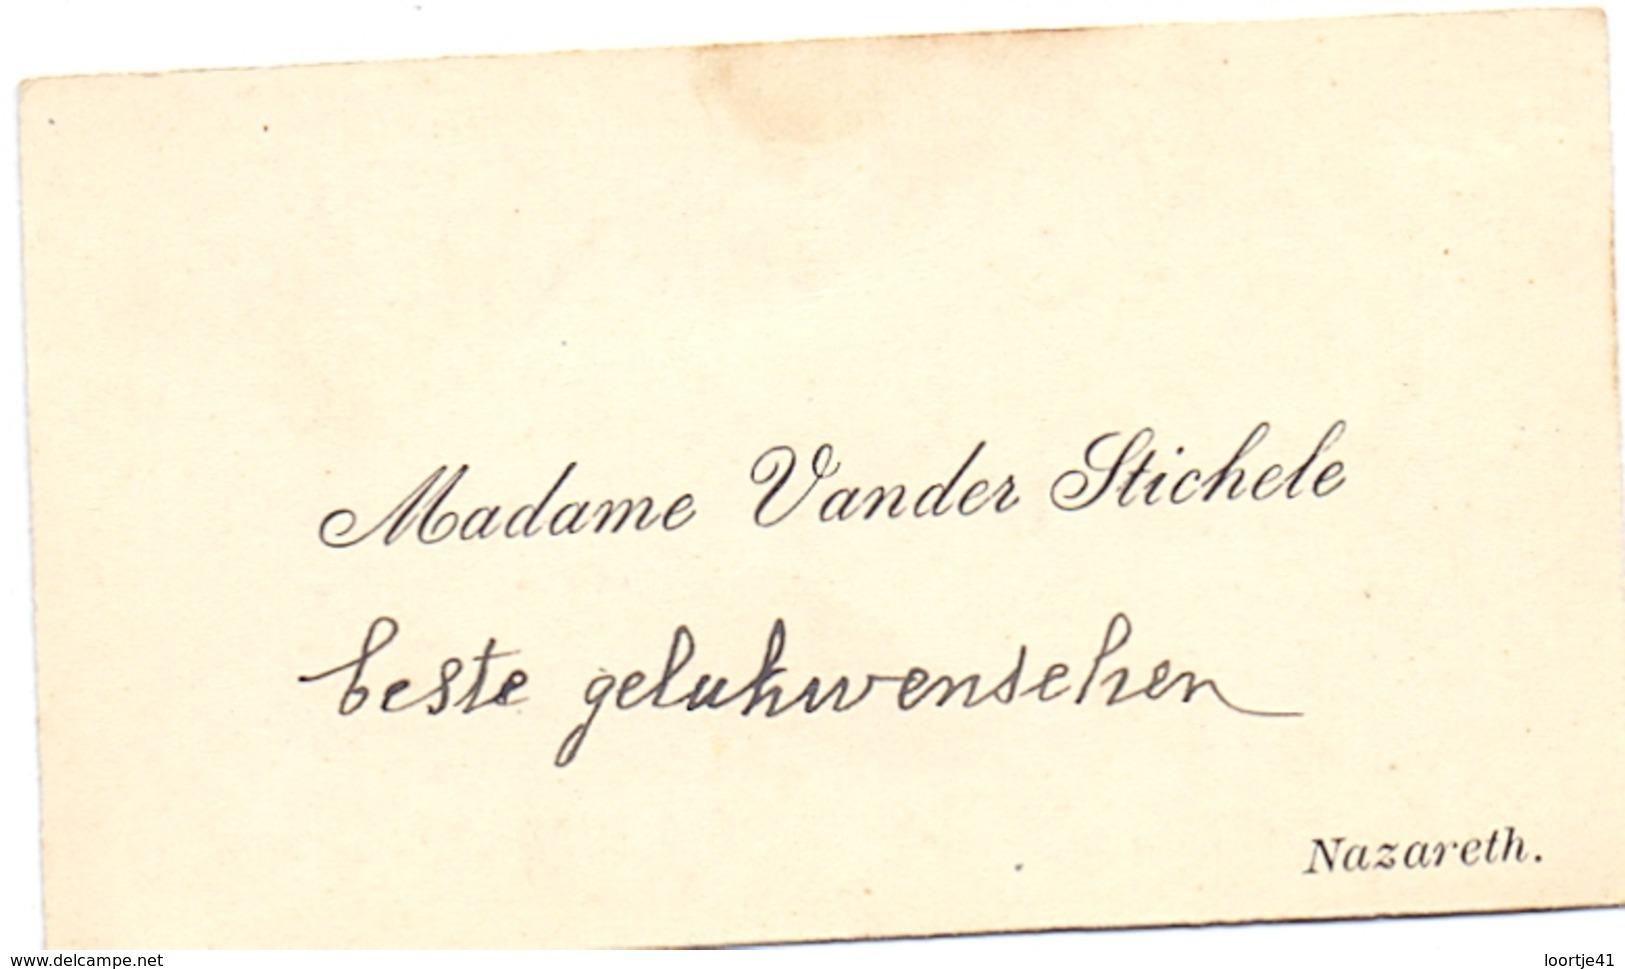 Visitekaartje - Carte Visite - Madame Vander Stichele - Nazareth - Cartes De Visite